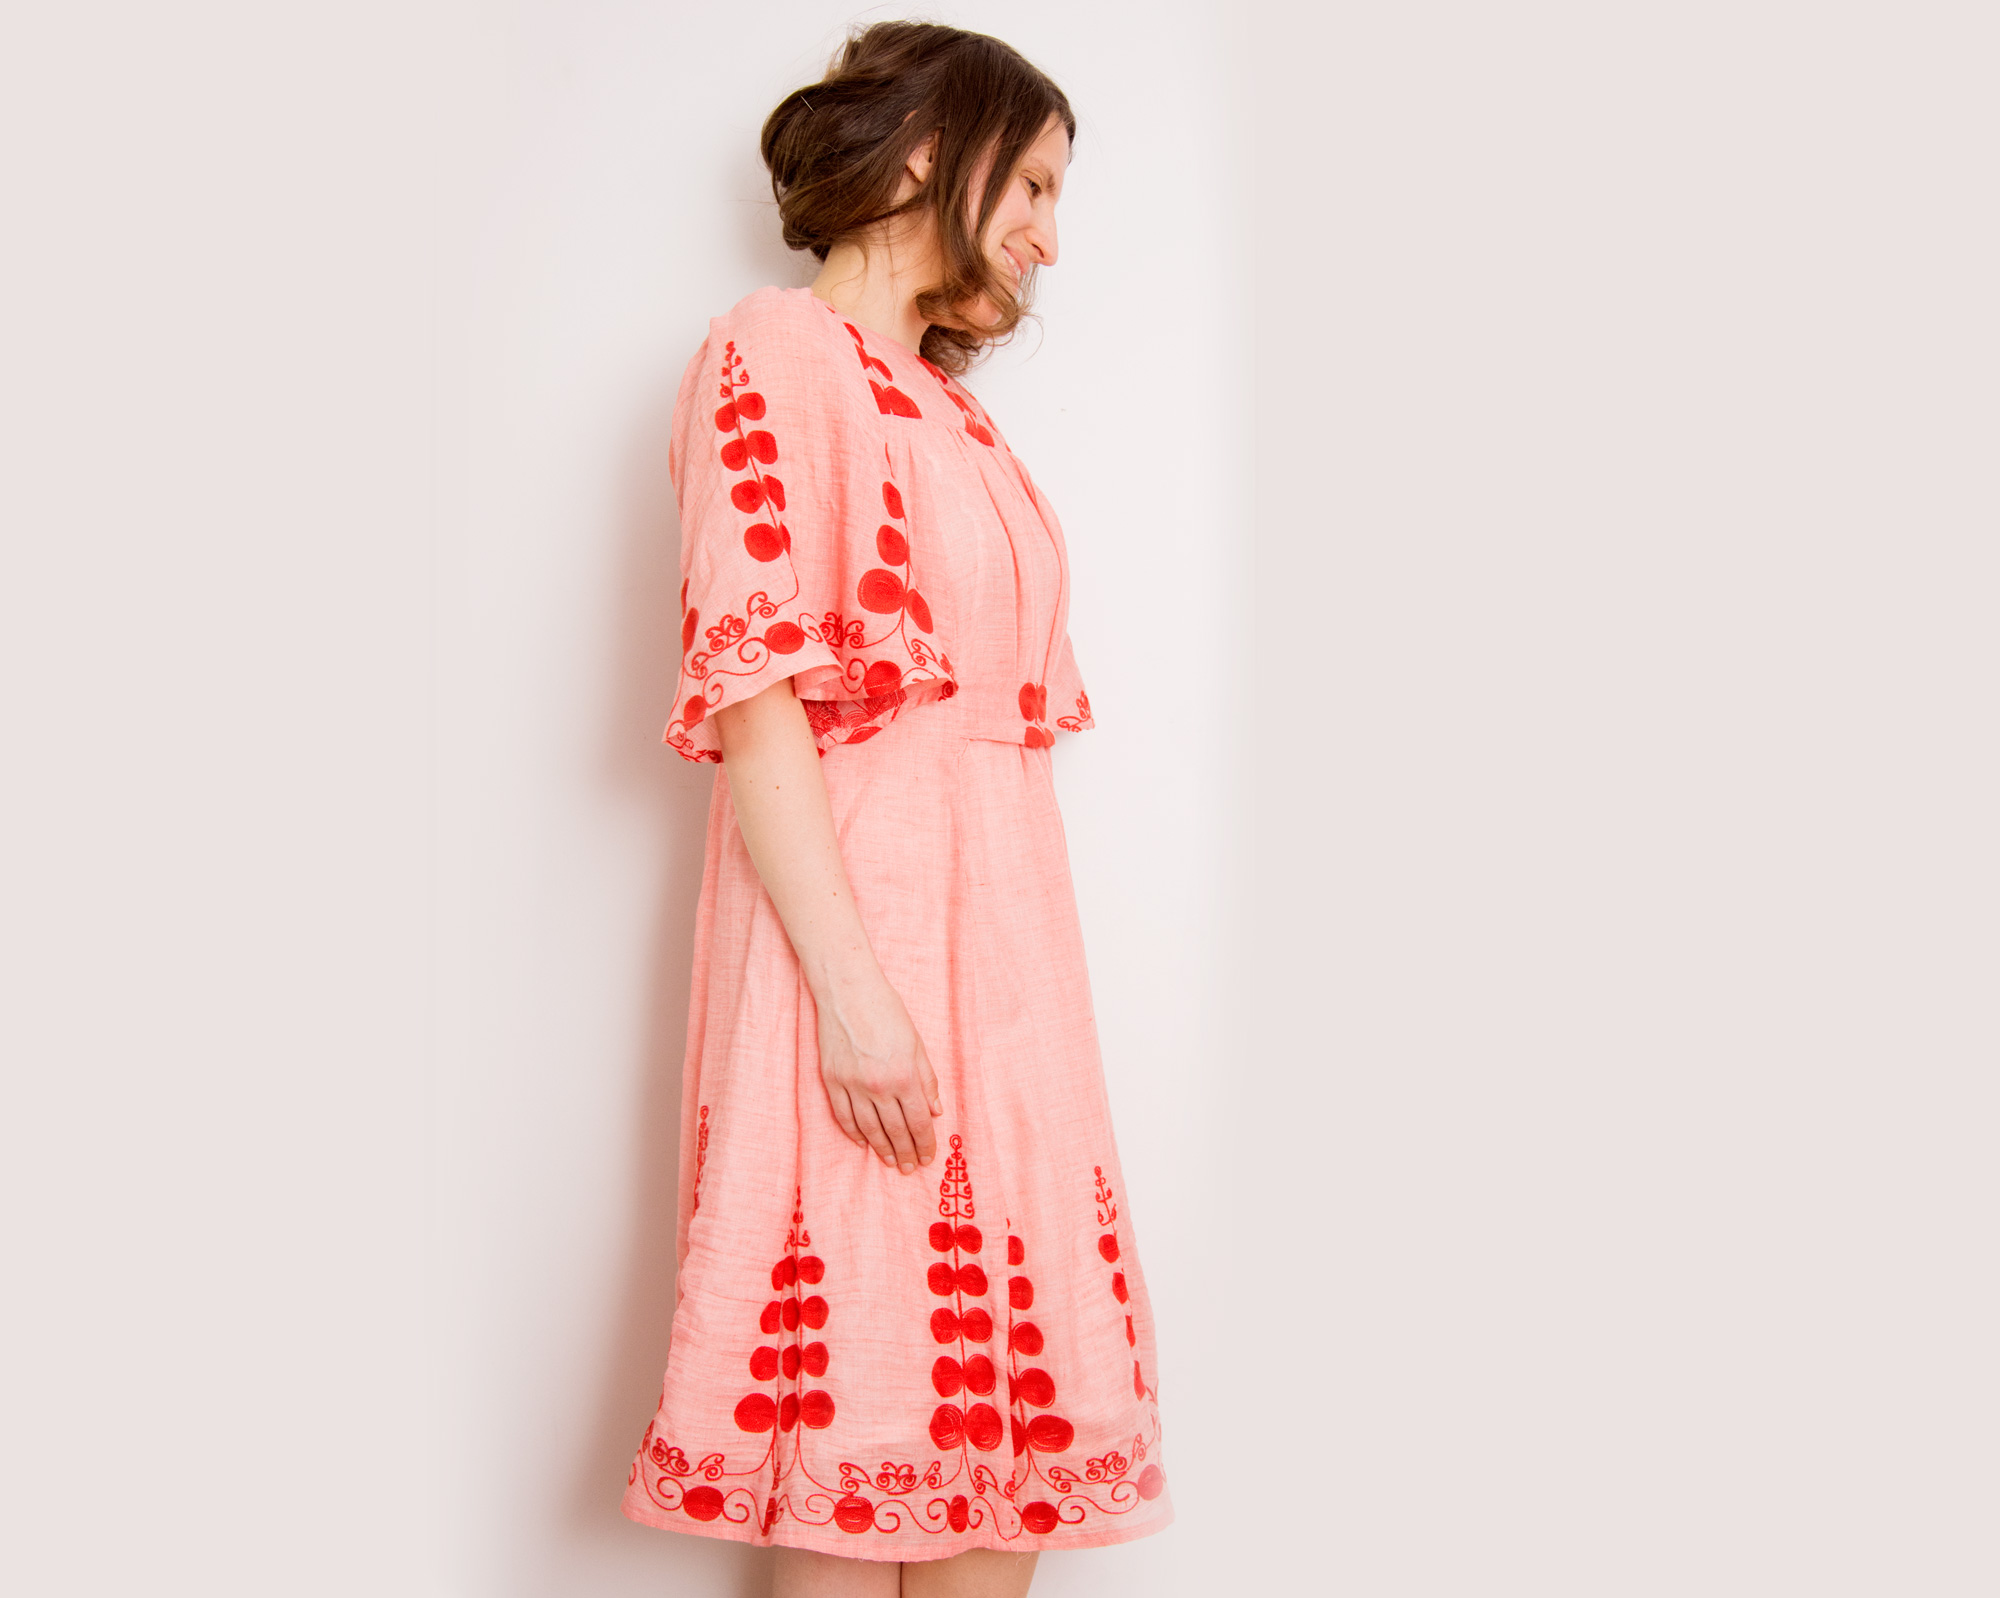 Burdastyle Frills Dress